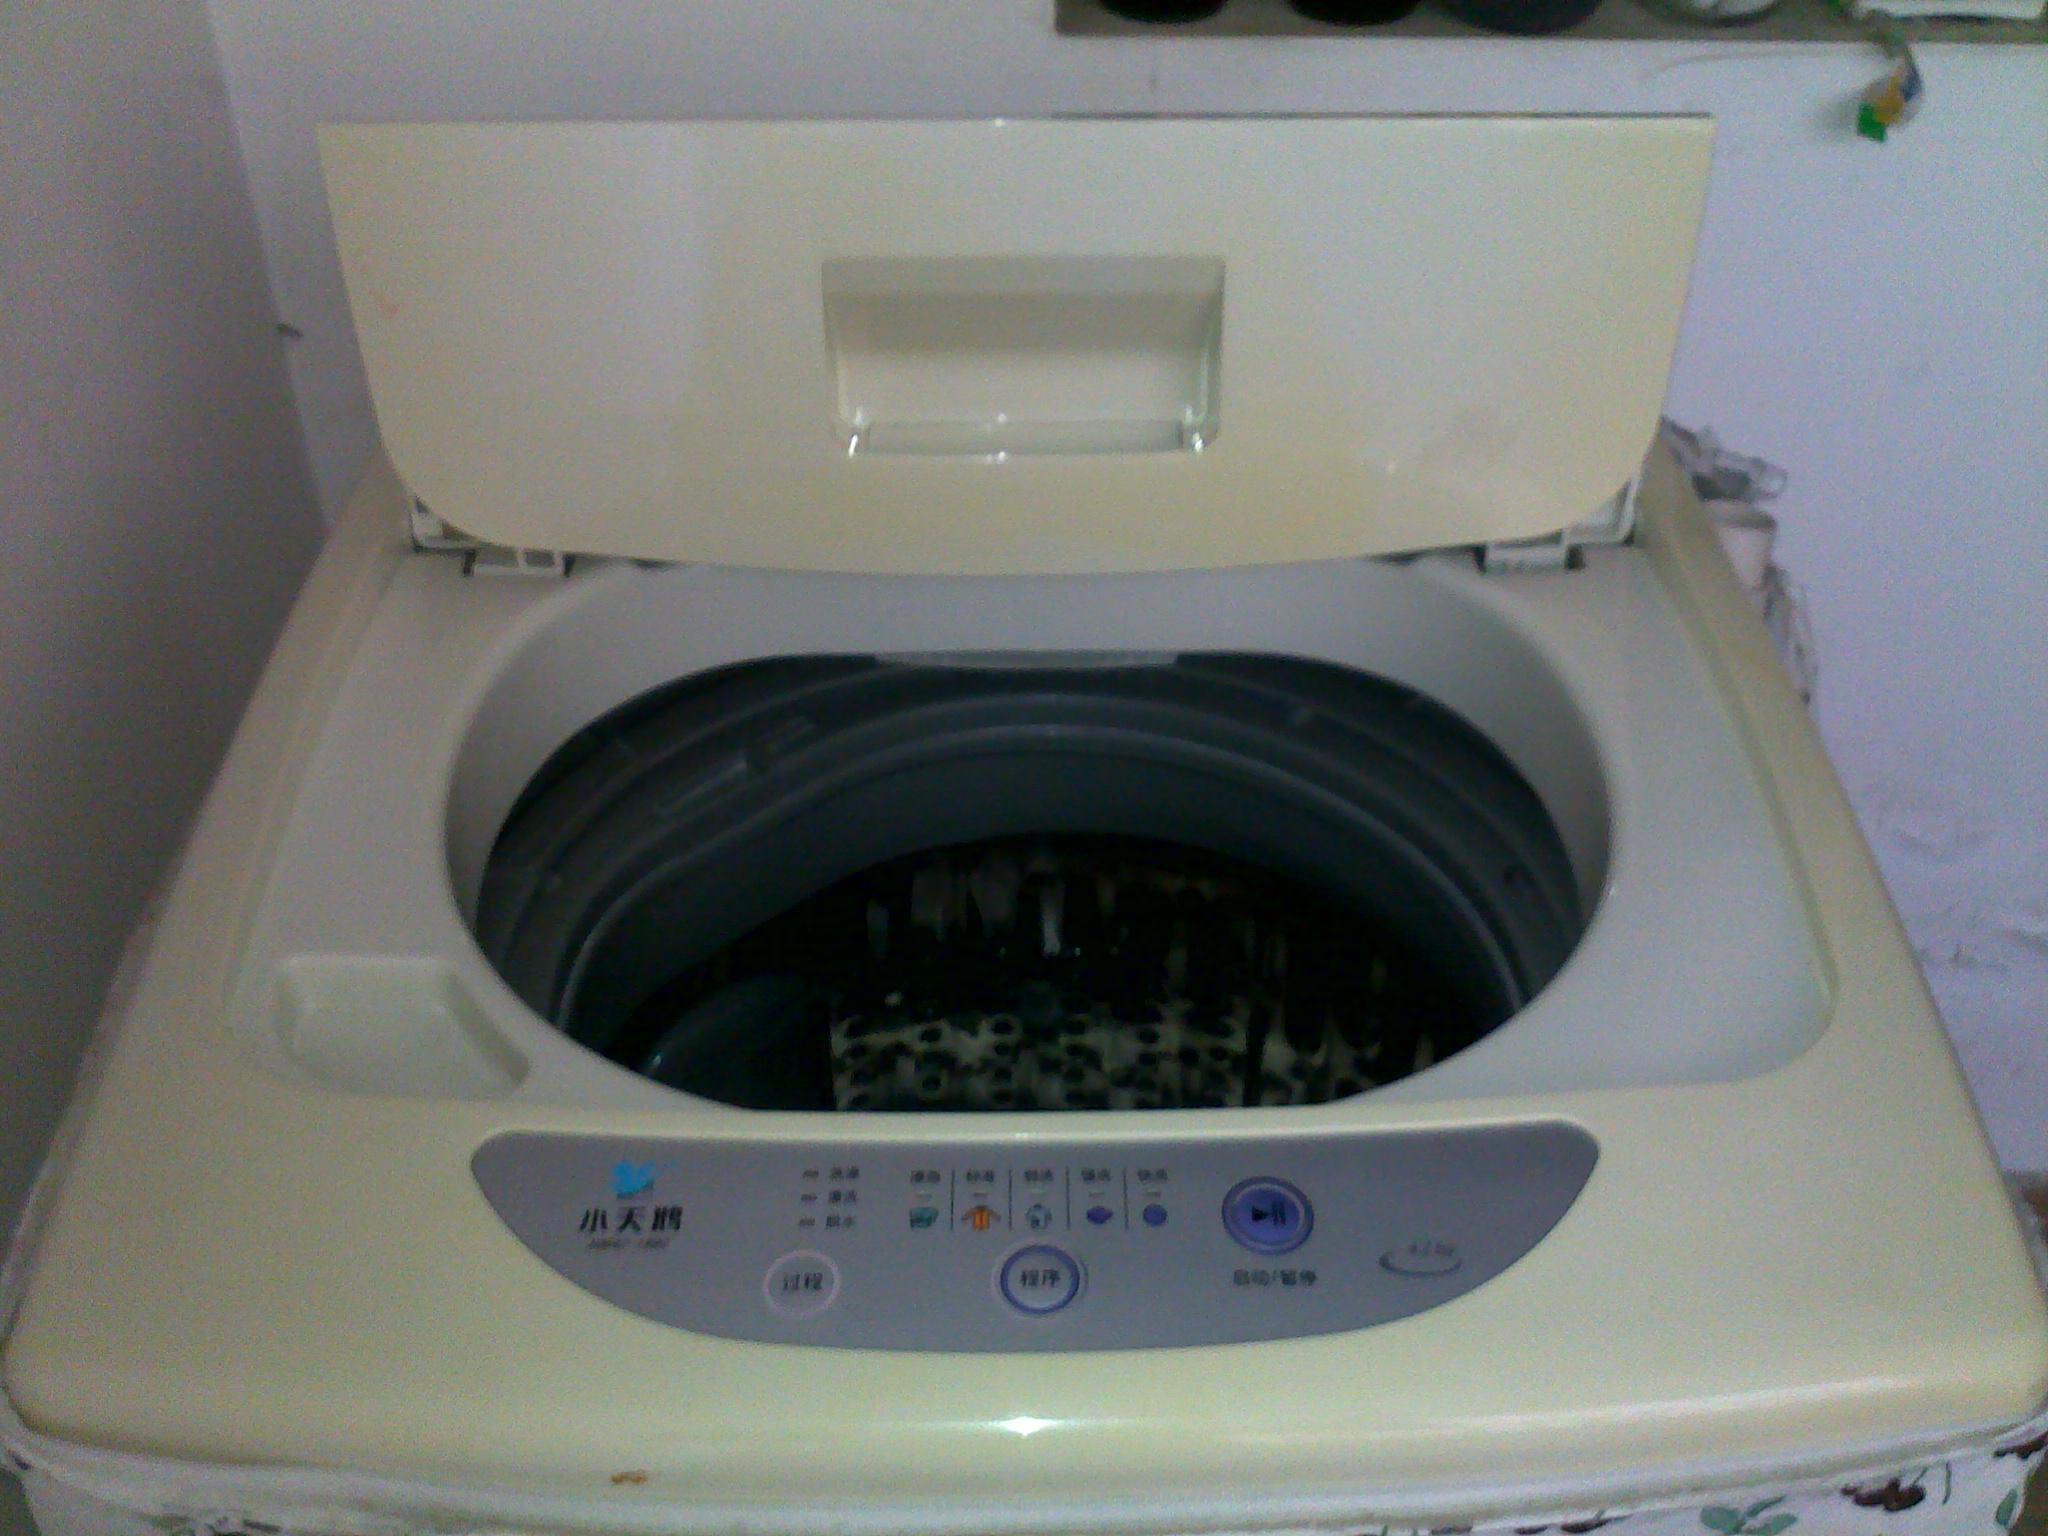 2kg全自动洗衣机一台 3,万利达dvd一台 4,暖太郎吹风机